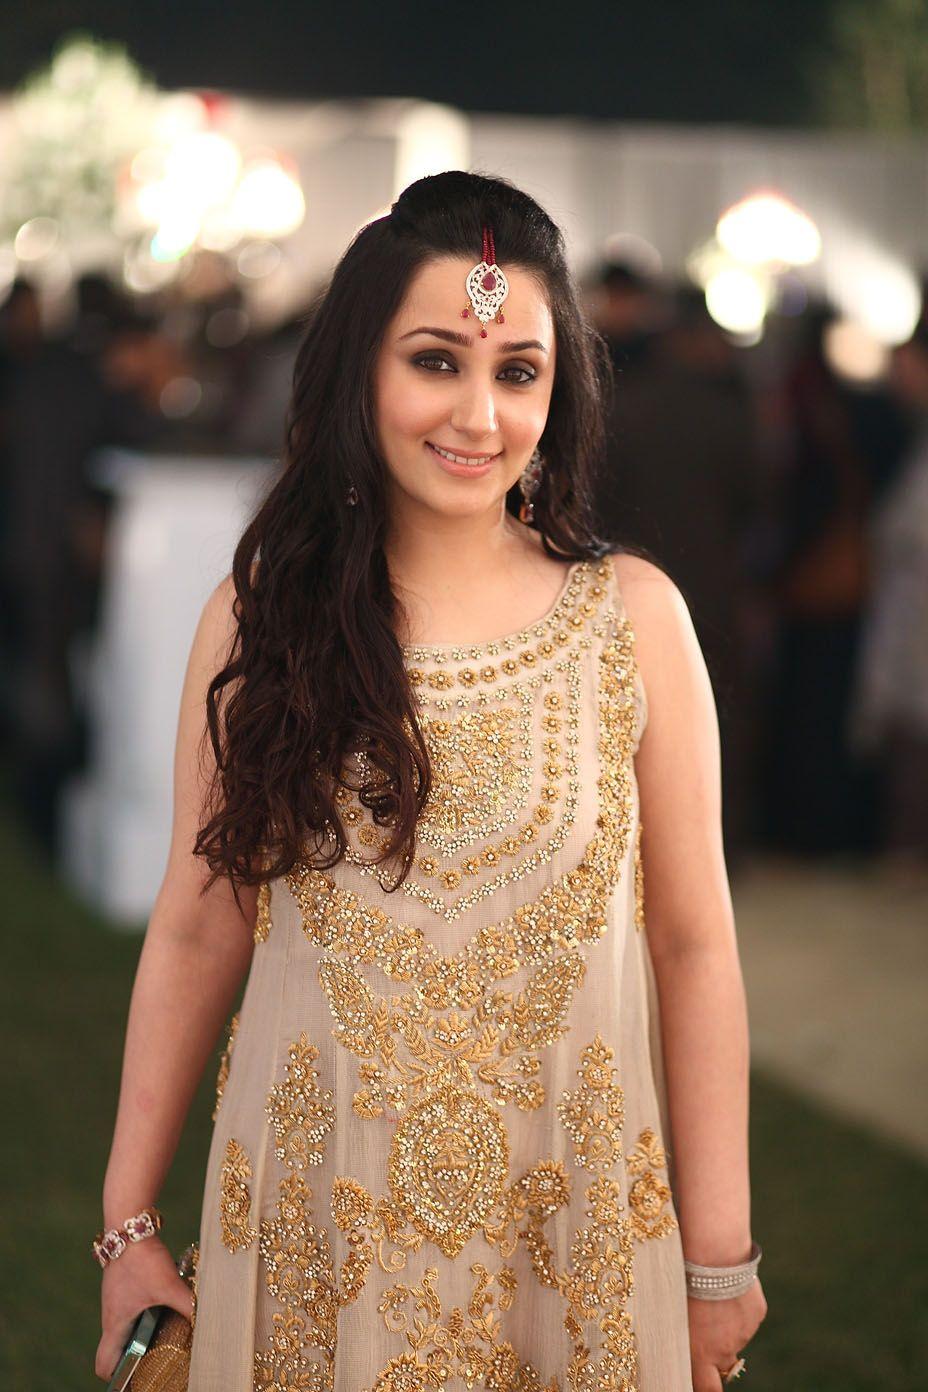 Madiha Hashmi Wearing Mina Hasan Desi Clothes Indian Dresses Eastern